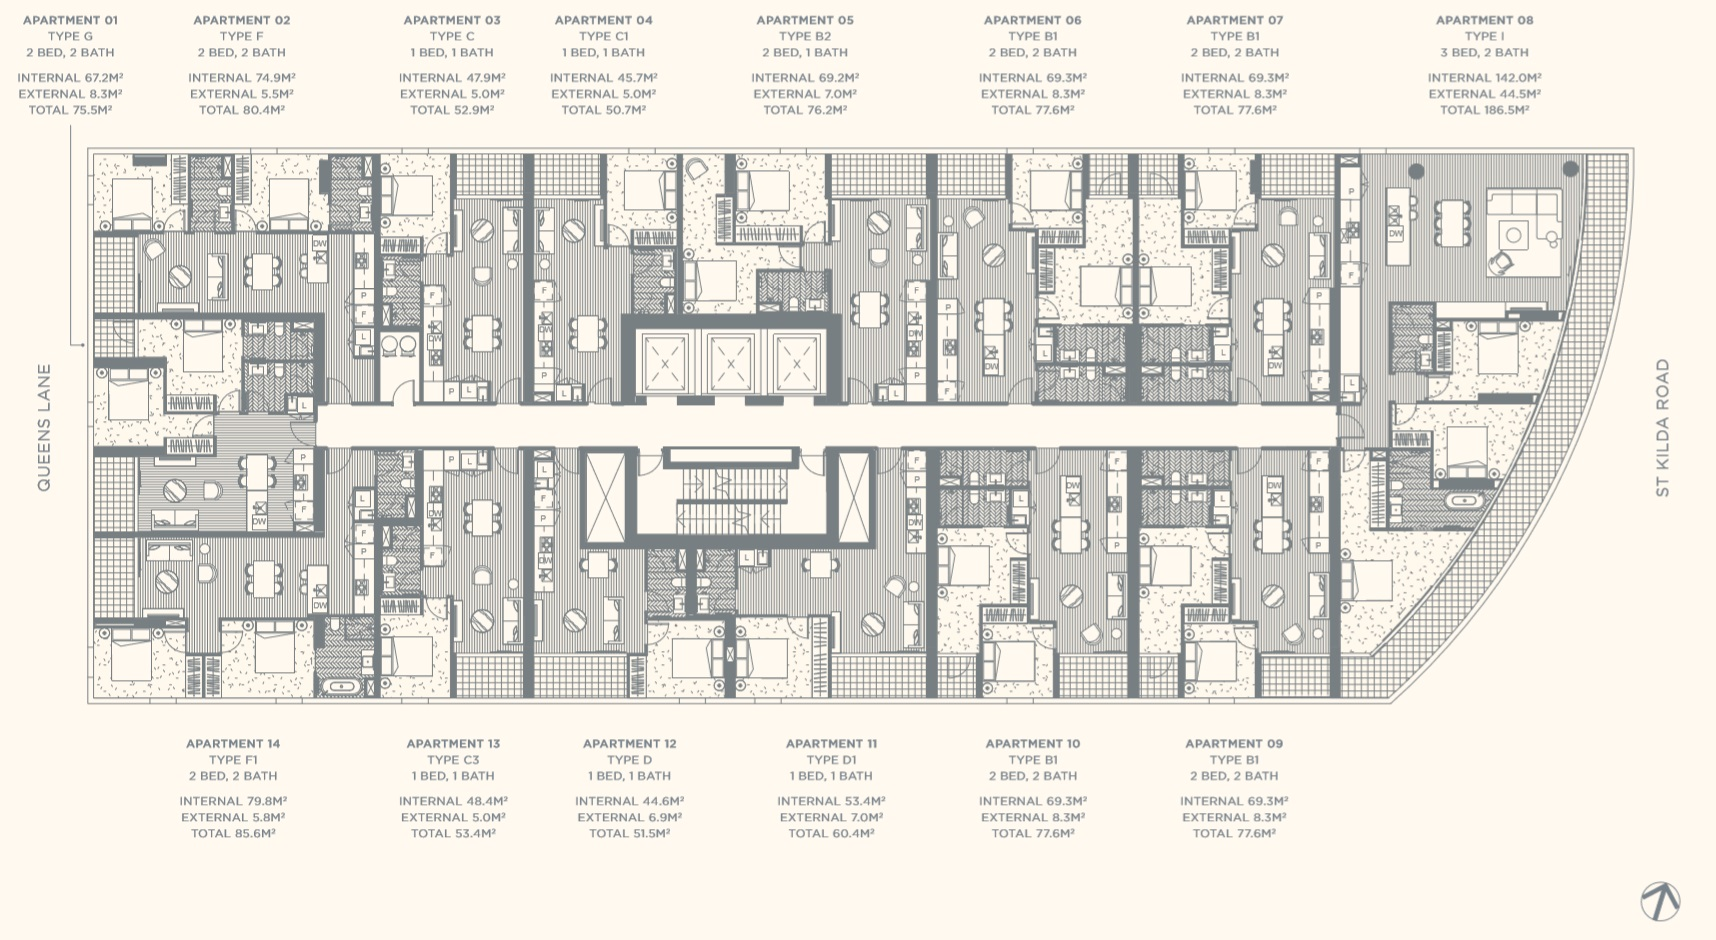 Floor Plate Level 09